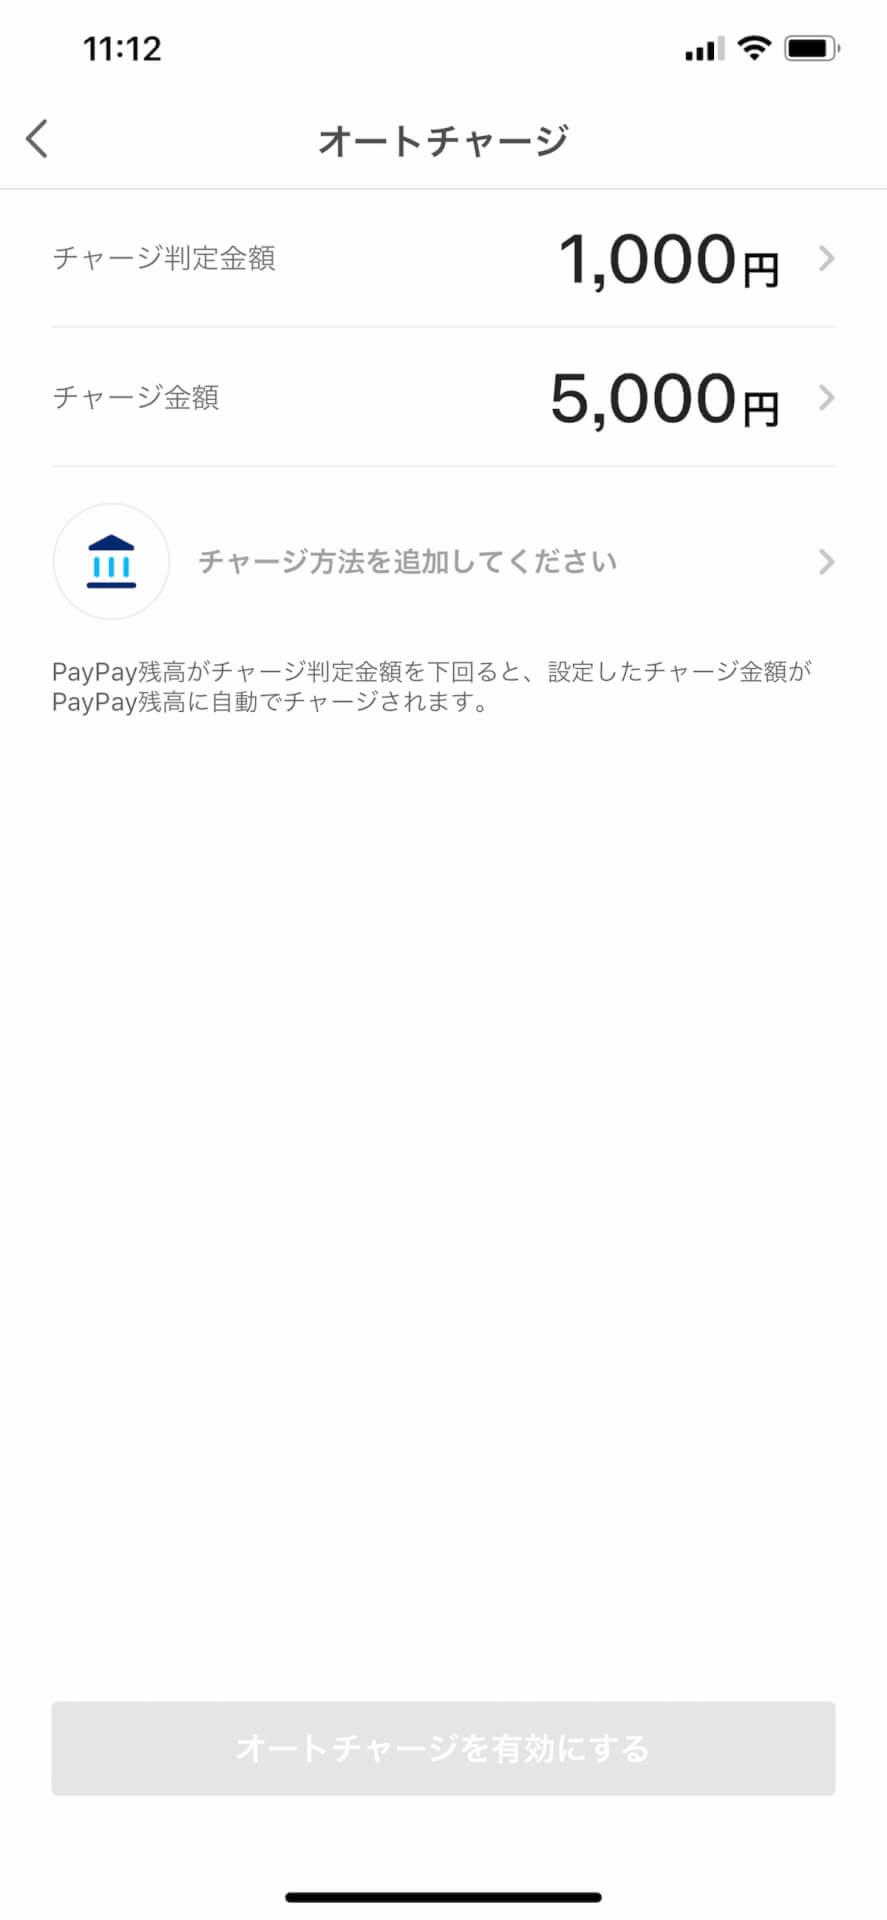 PayPay、iOS版アプリのアップデートでオートチャージ機能が追加|銀行口座、Yahoo!カードからチャージ tech190528_paypay_4